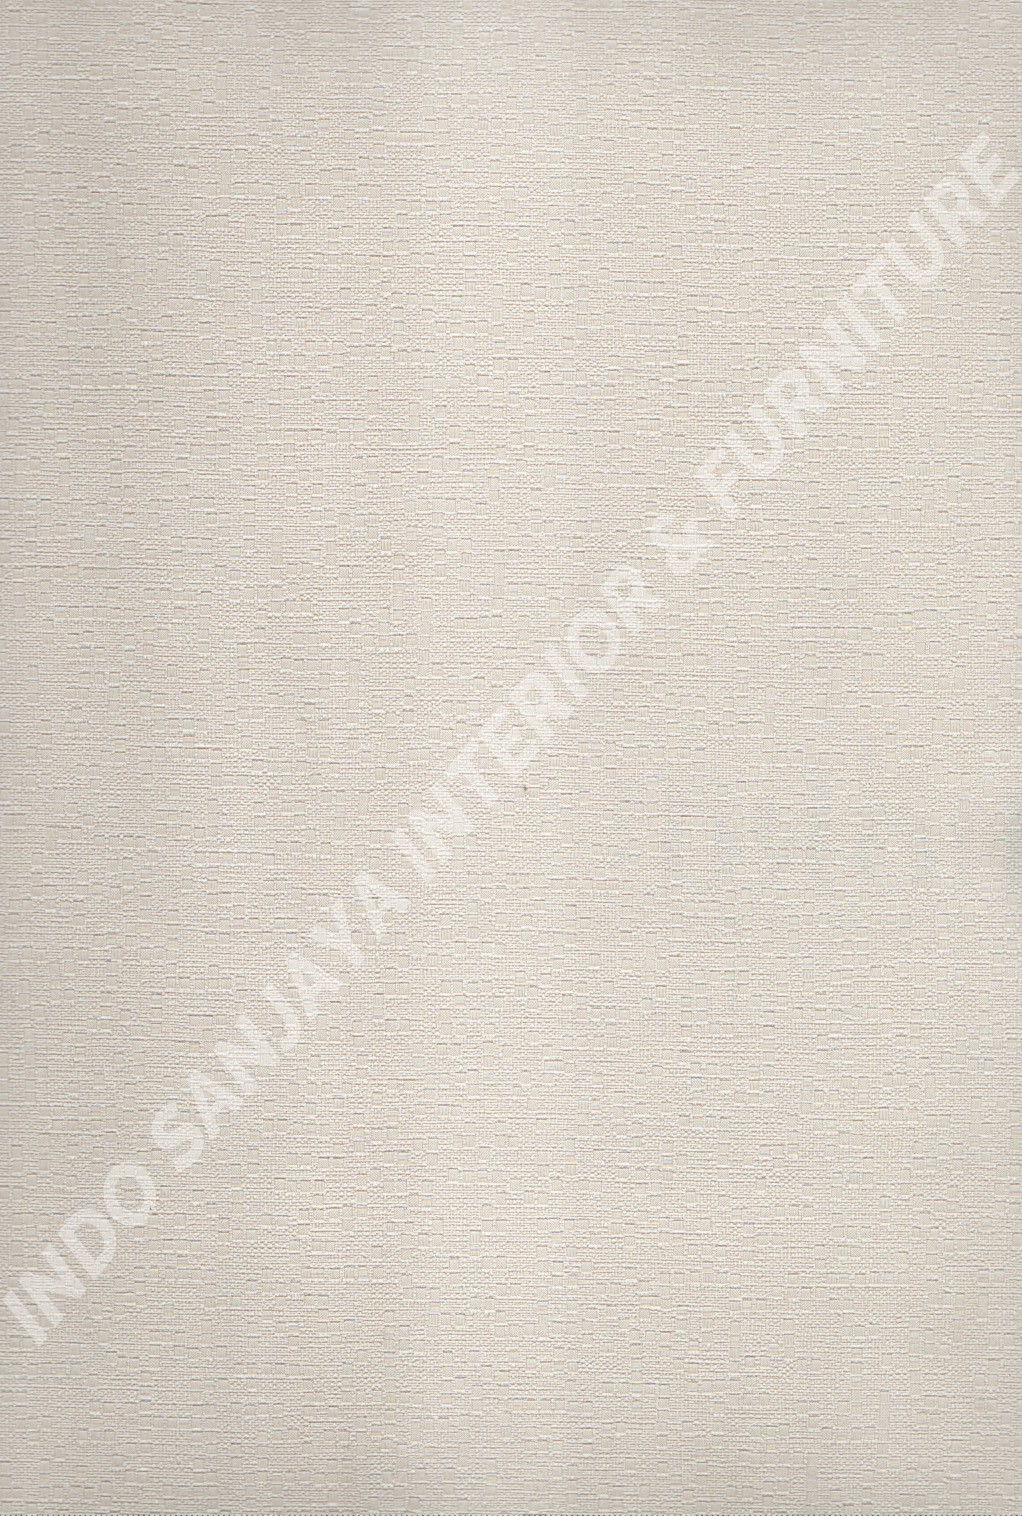 wallpaper   Wallpaper Minimalis Polos 3063:3063 corak  warna